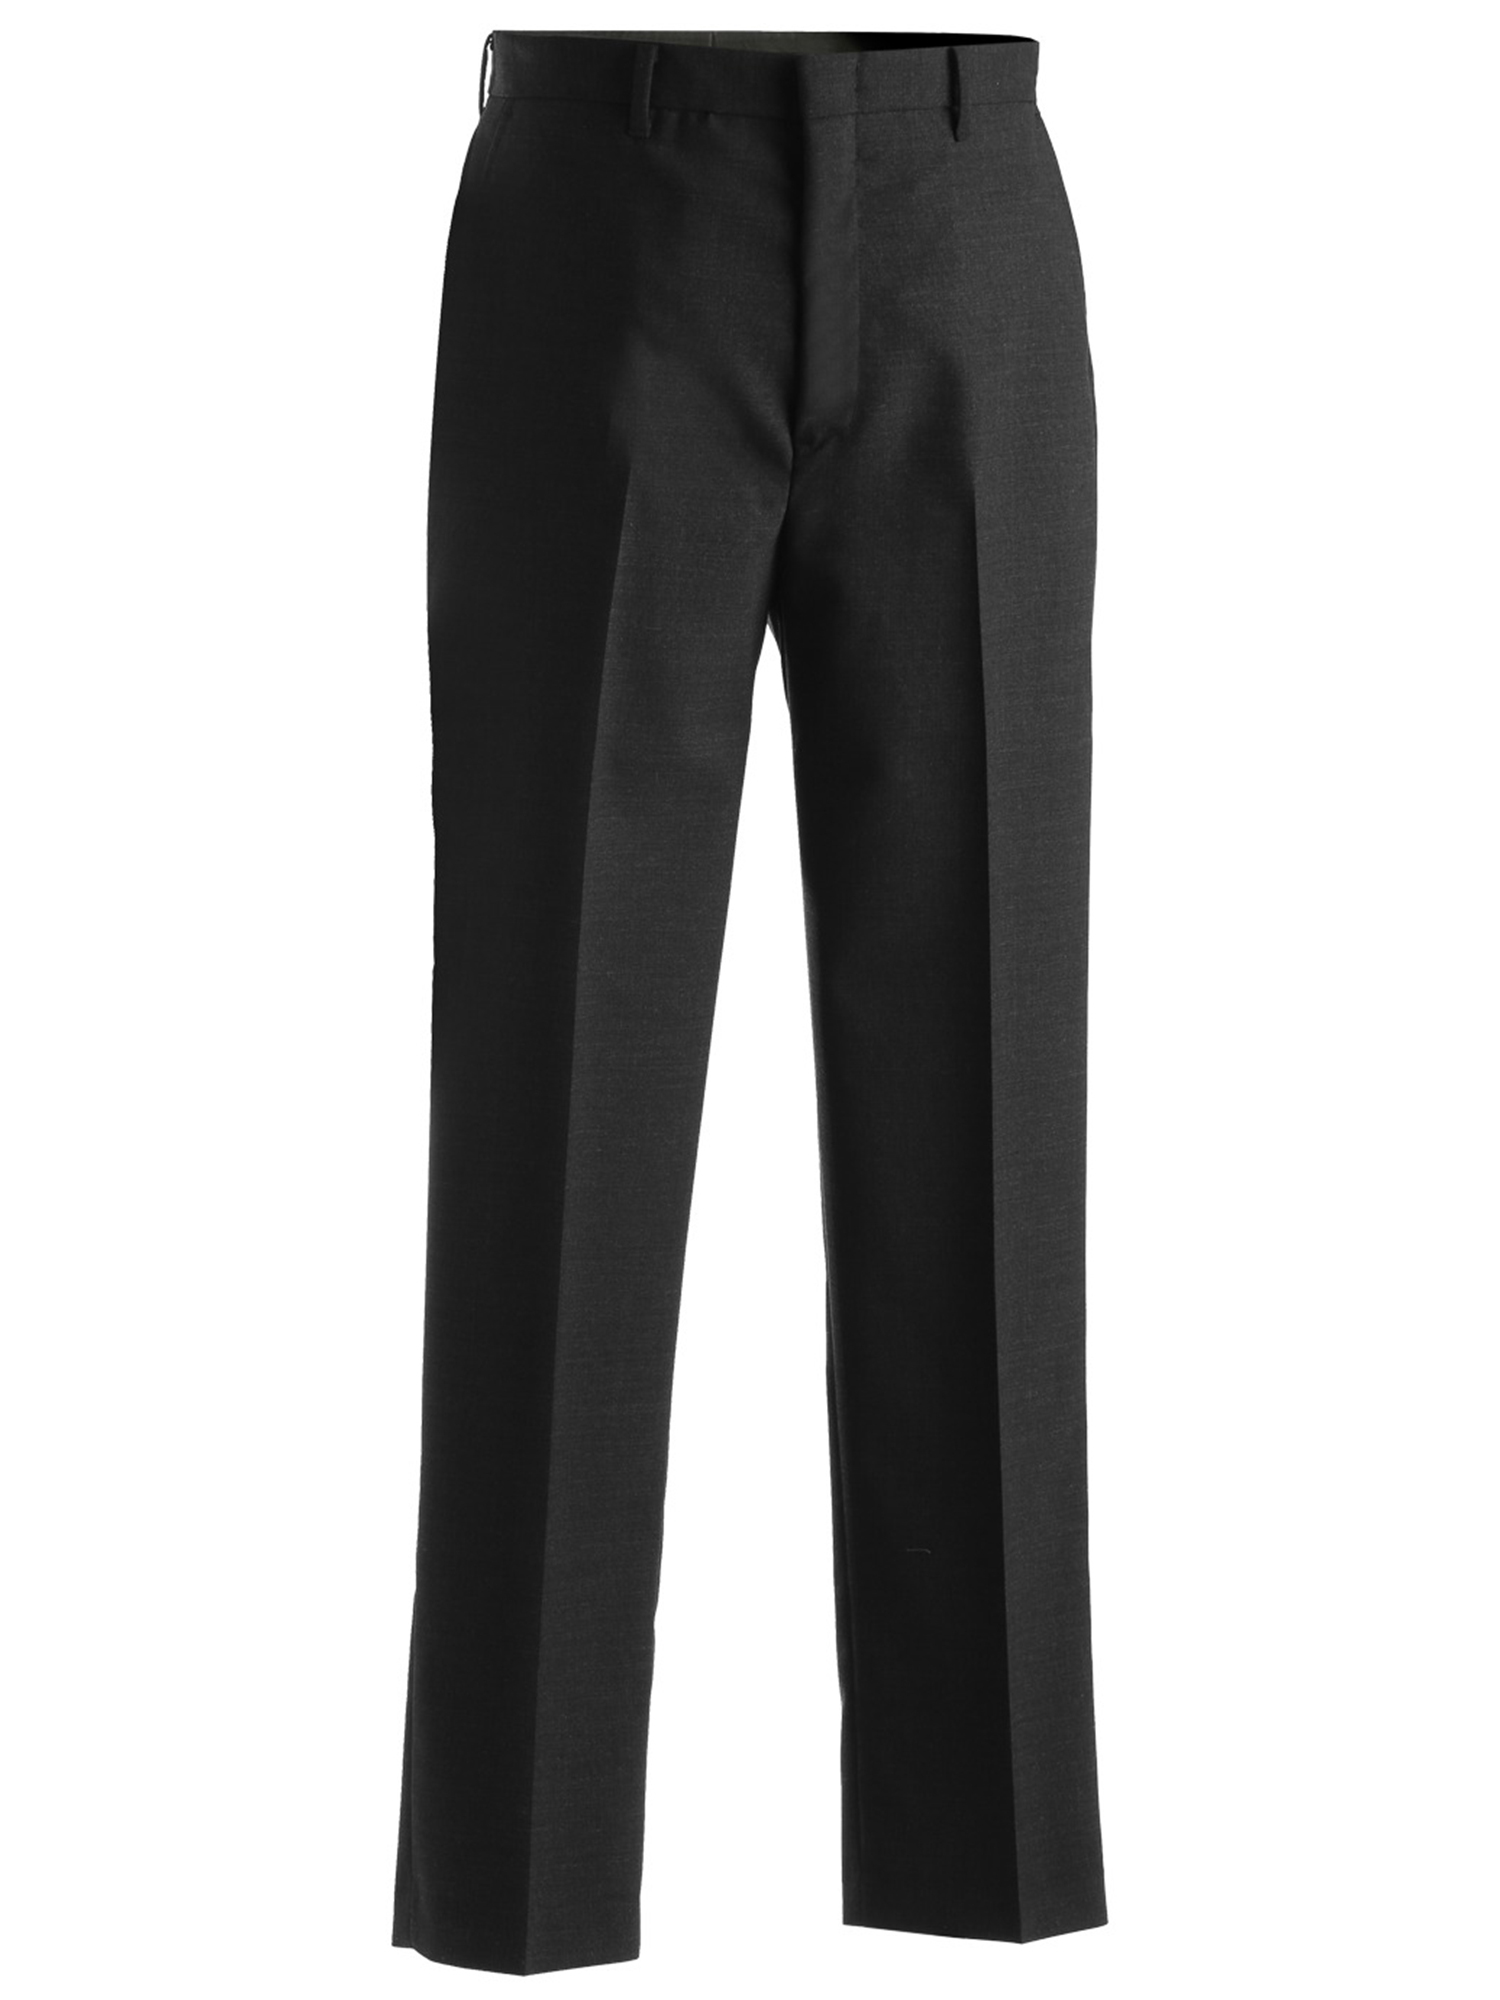 Ed Garments Men's Flat Front Classic Dress Pant, NAVY, 48 UL